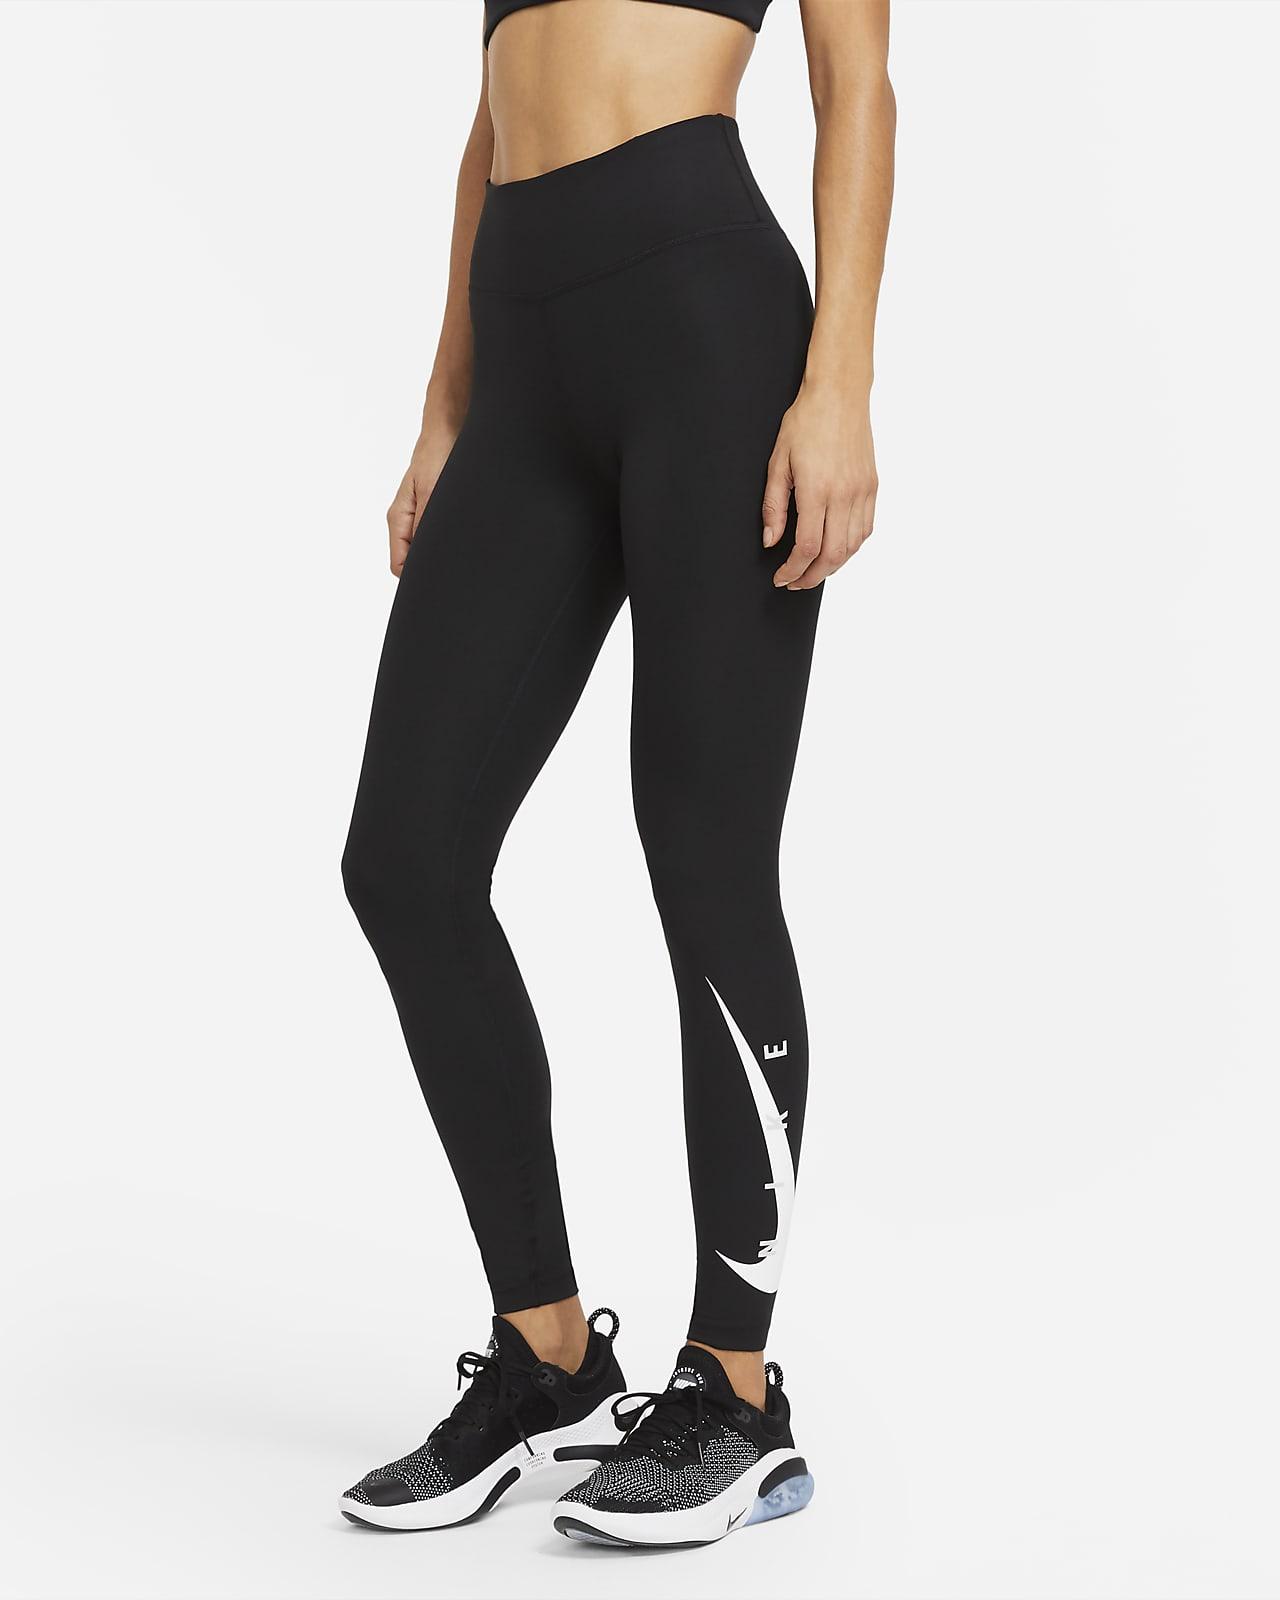 Nike Swoosh Run 7/8 女子跑步紧身裤